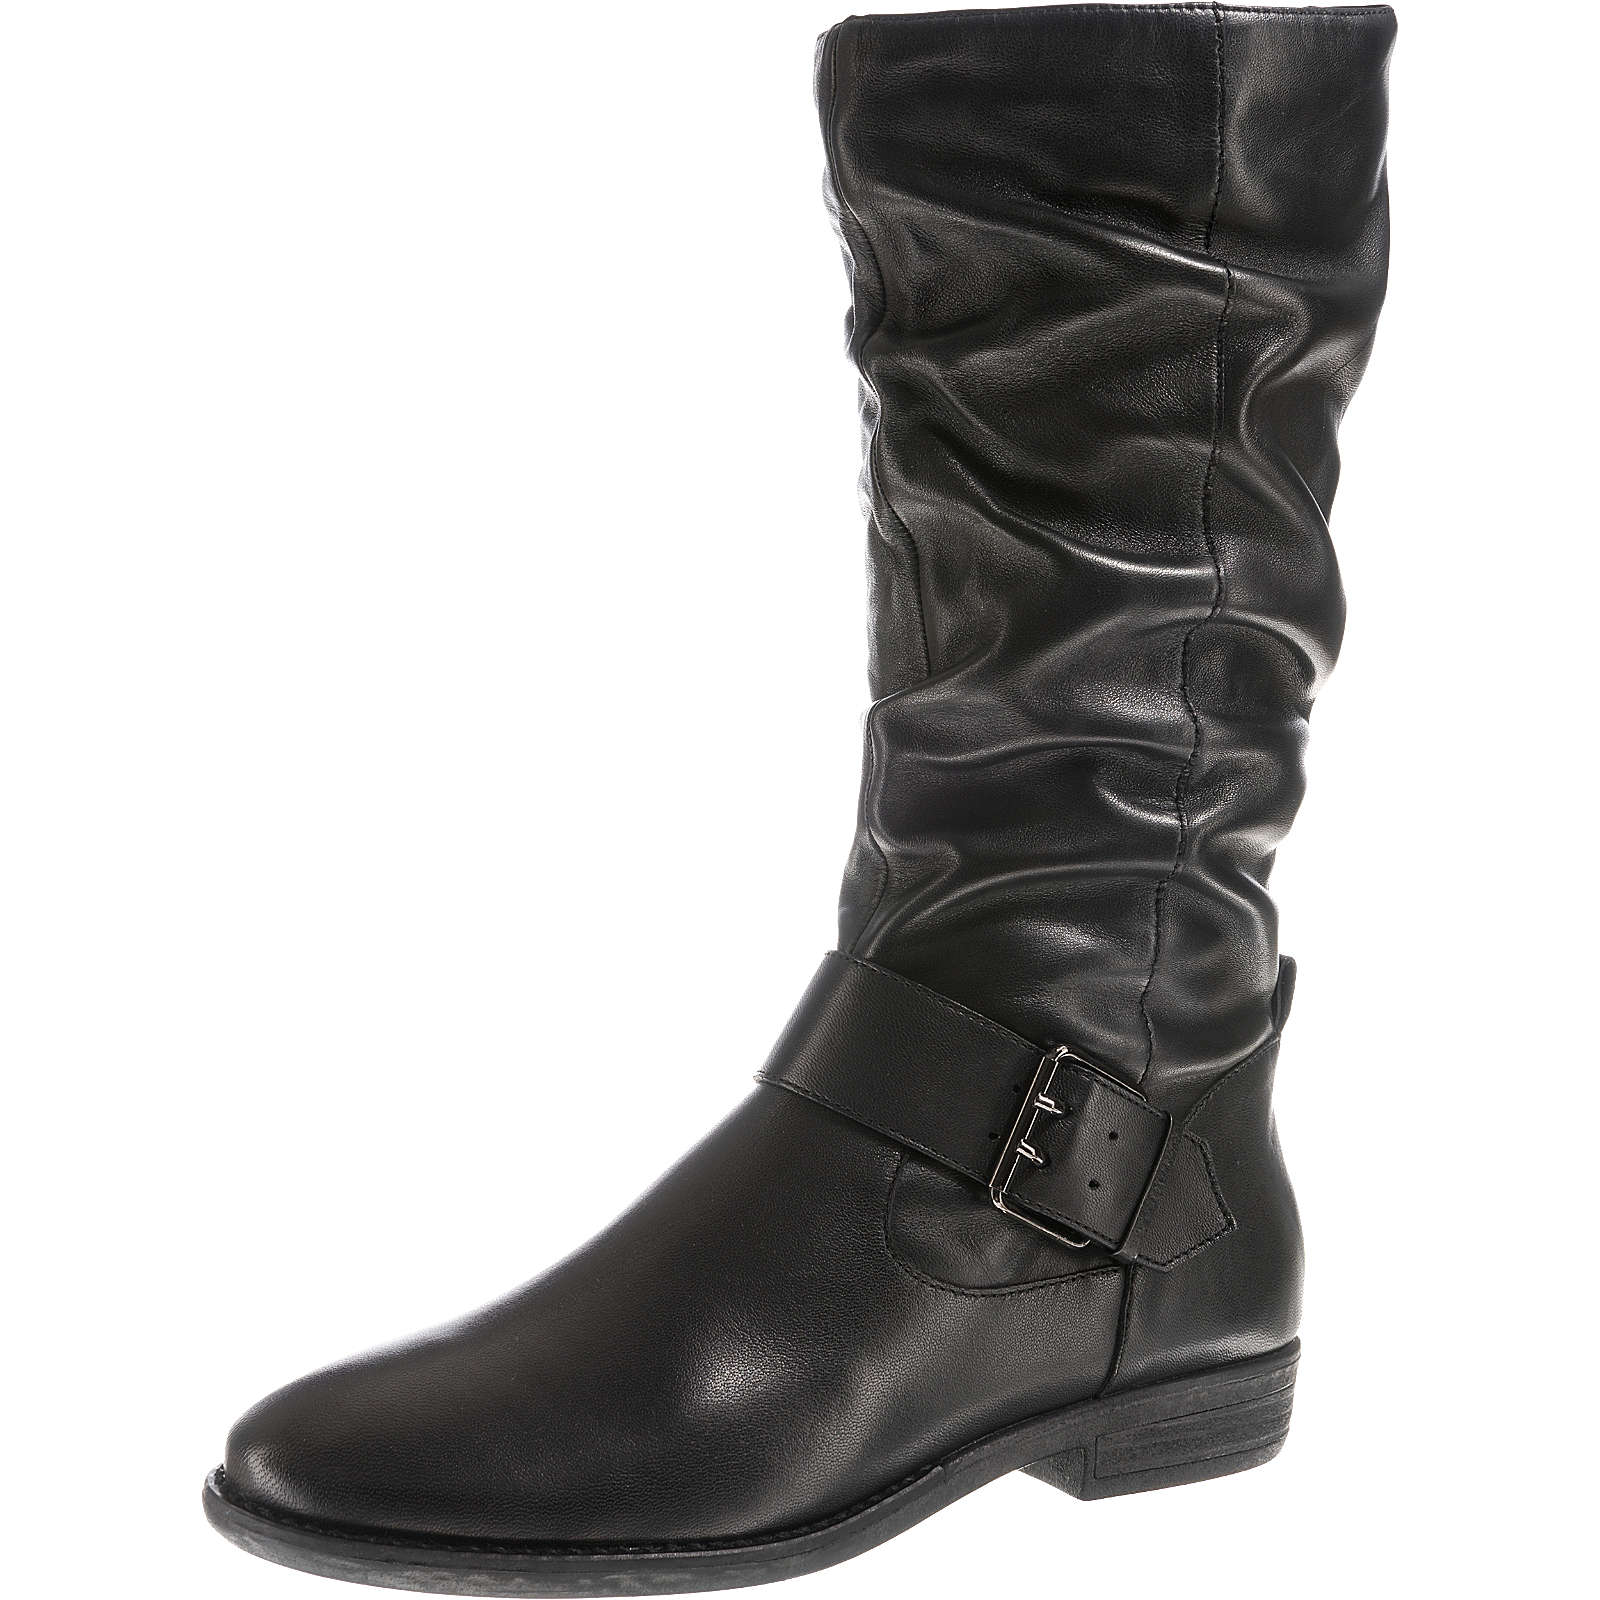 SPM Klassische Stiefel schwarz Damen Gr. 37